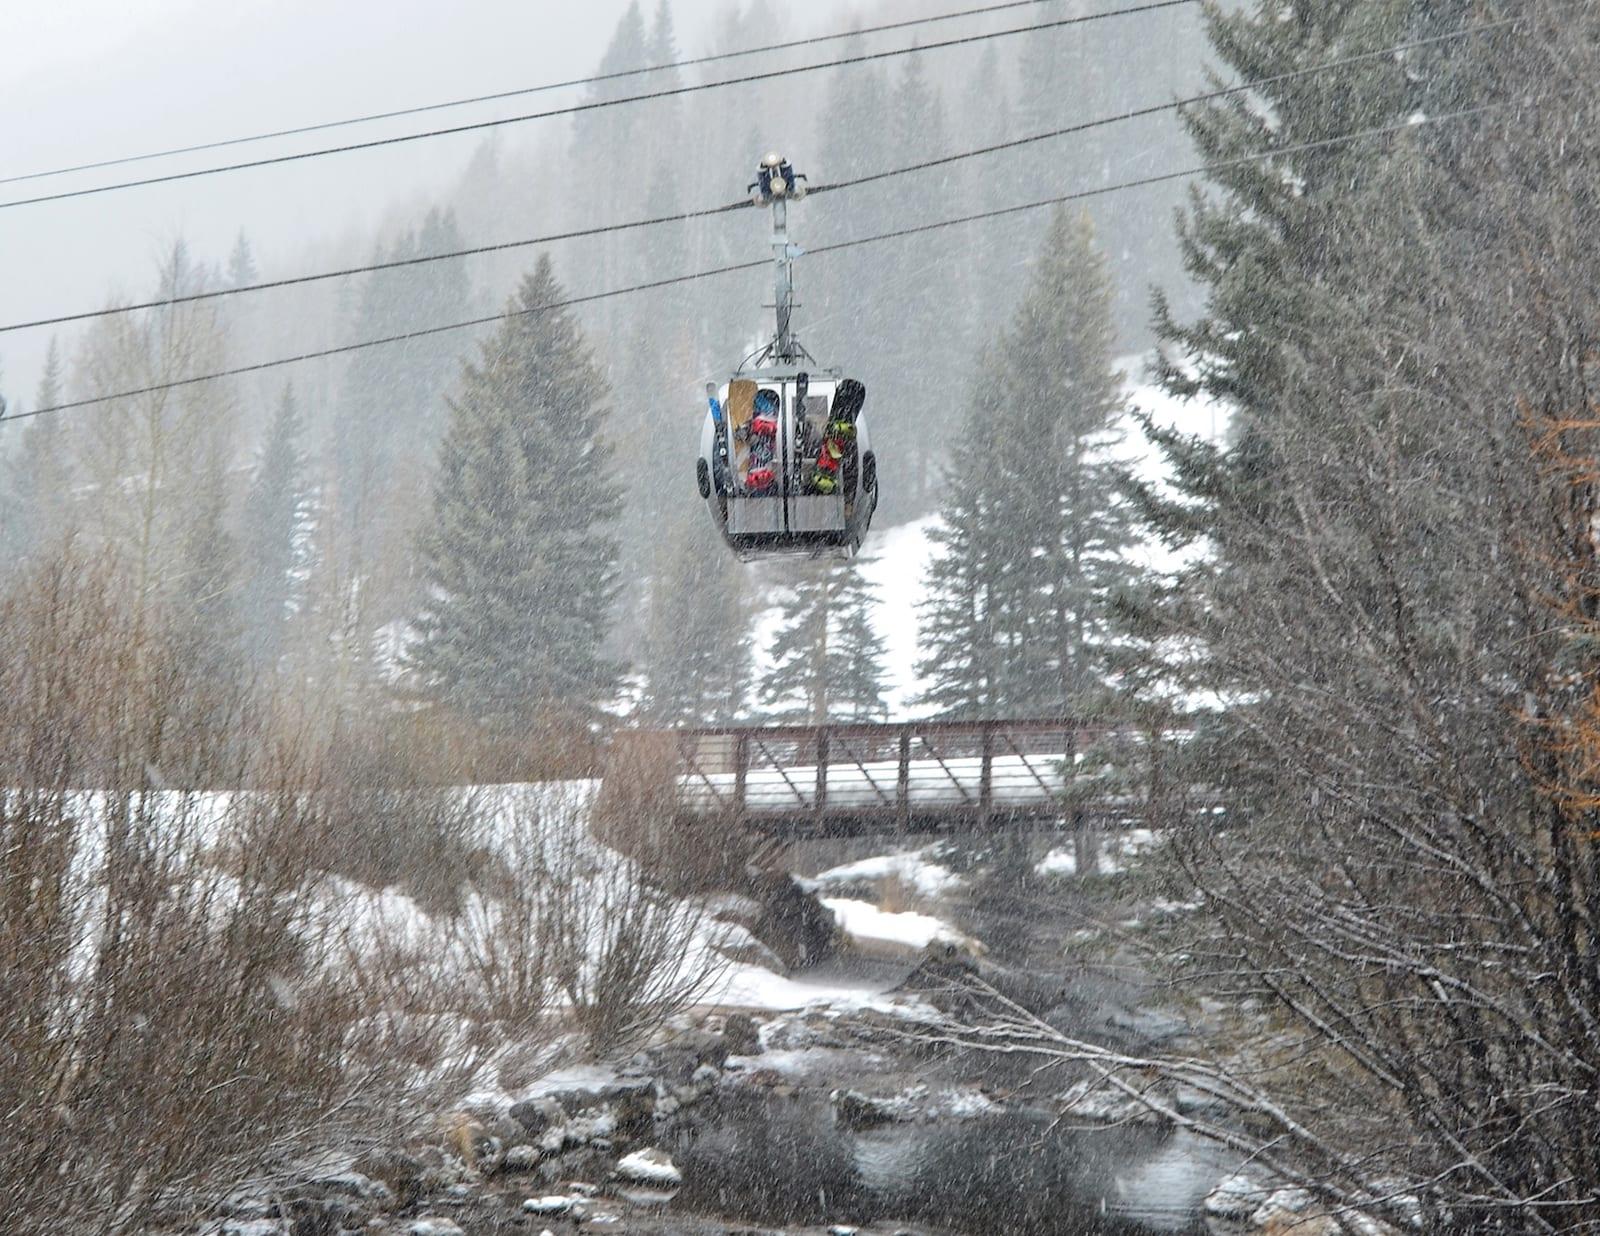 Gondola Car Telluride Ski Resort Snow Falling